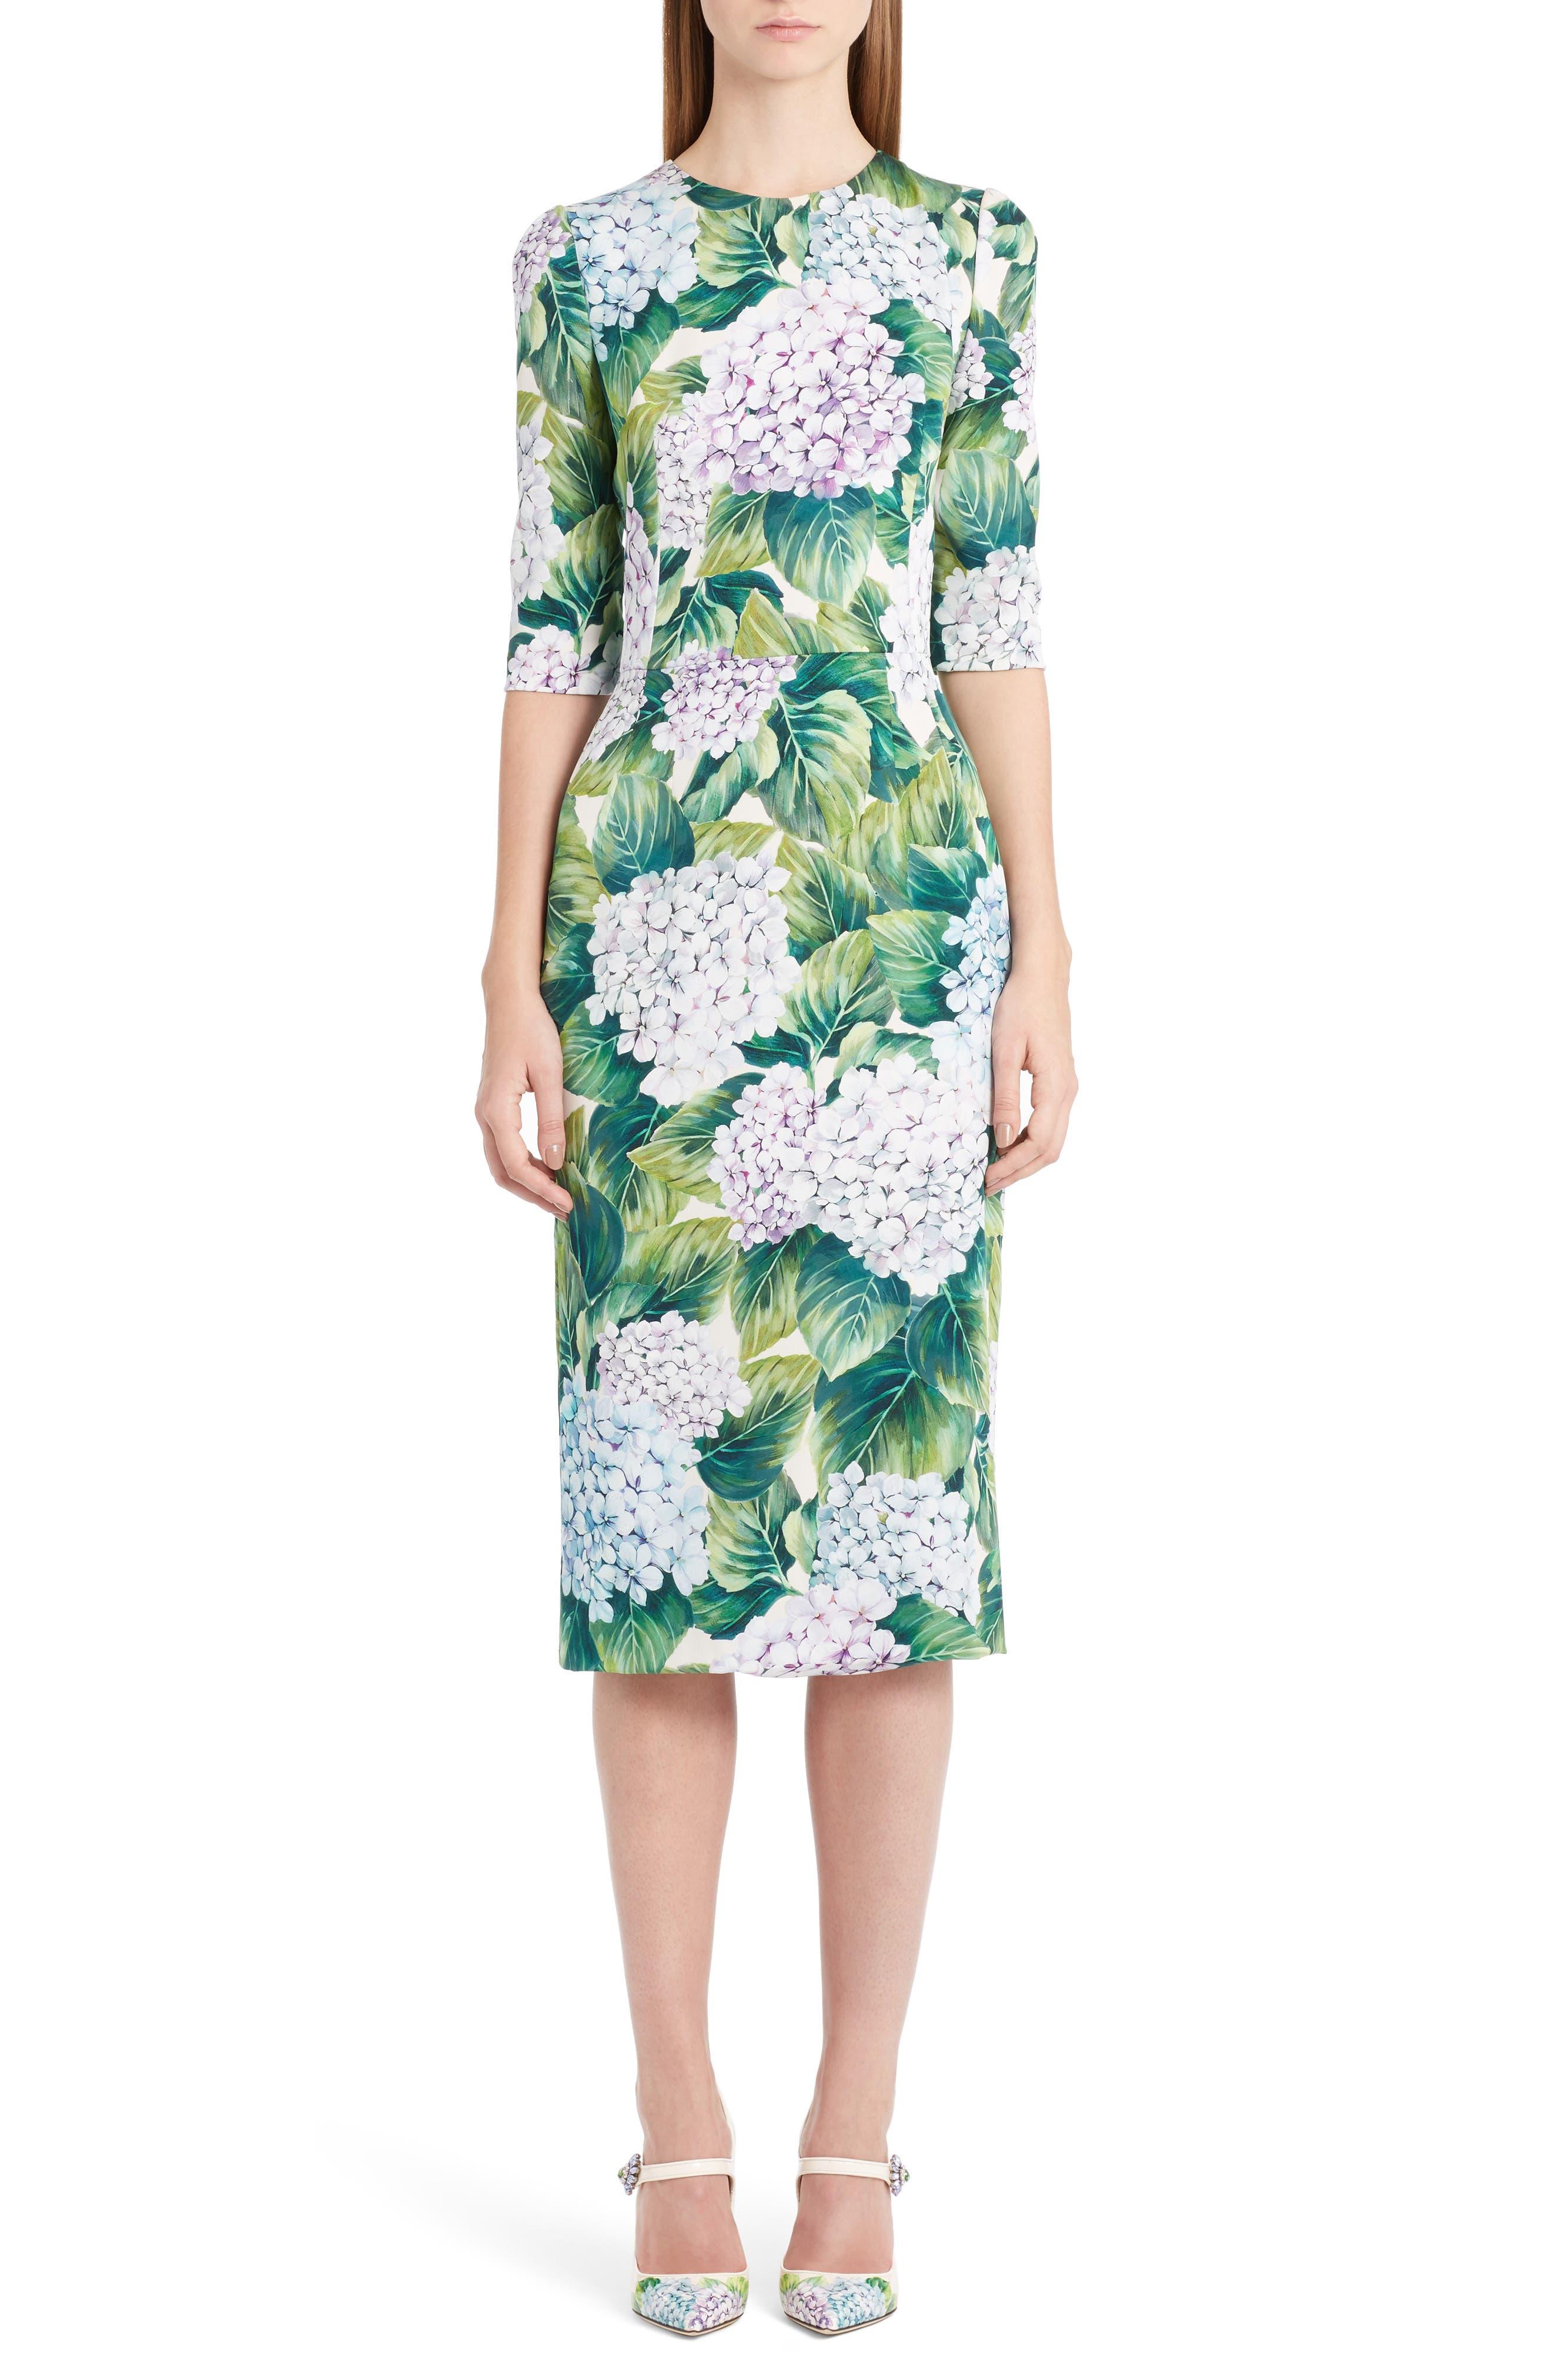 Dolce&Gabbana Hydrangea Print Stretch Silk Dress